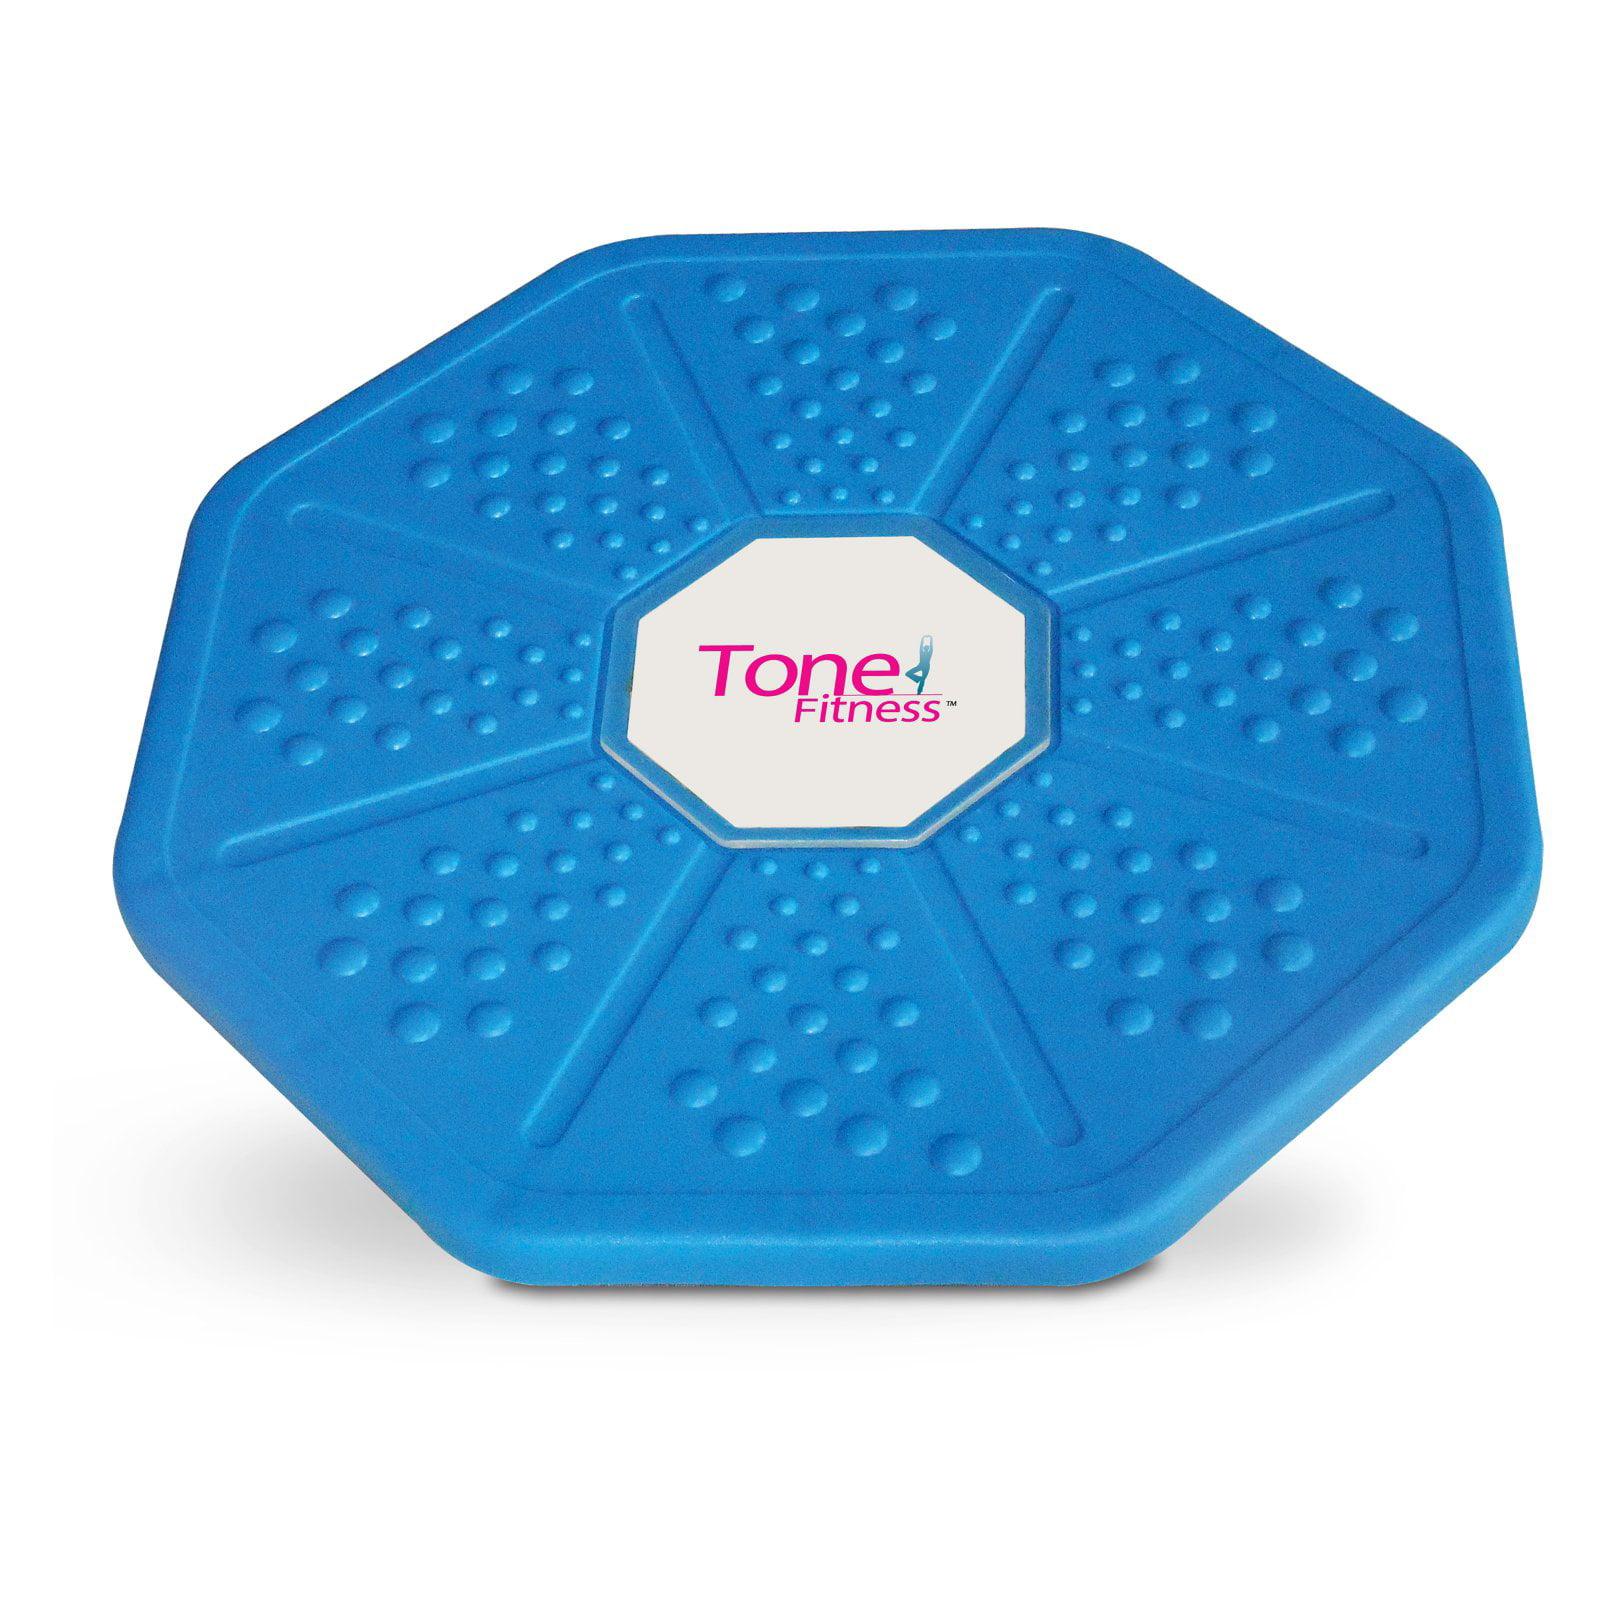 CAP Barbell Tone Fitness Balance Board